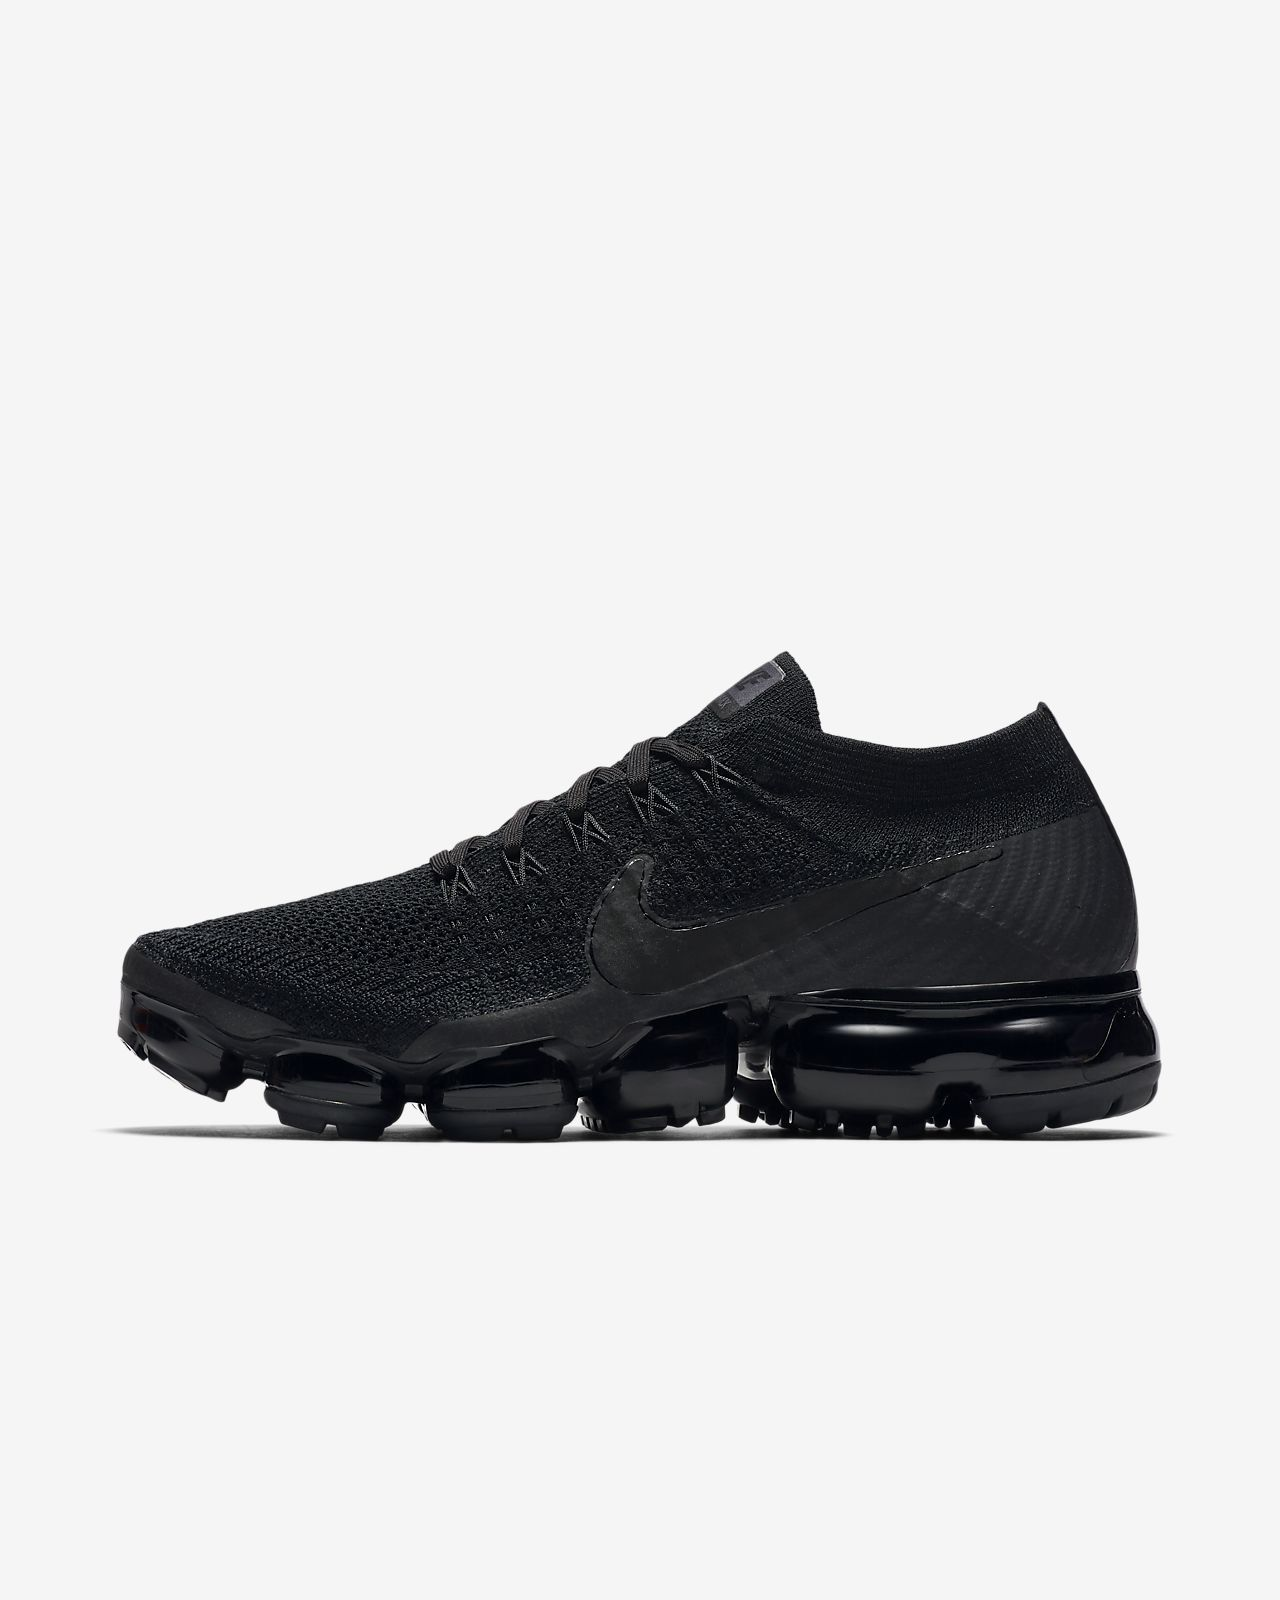 new style 2f3c2 e81a8 ... Nike Air VaporMax Flyknit «Triple Noir» løpesko for dame